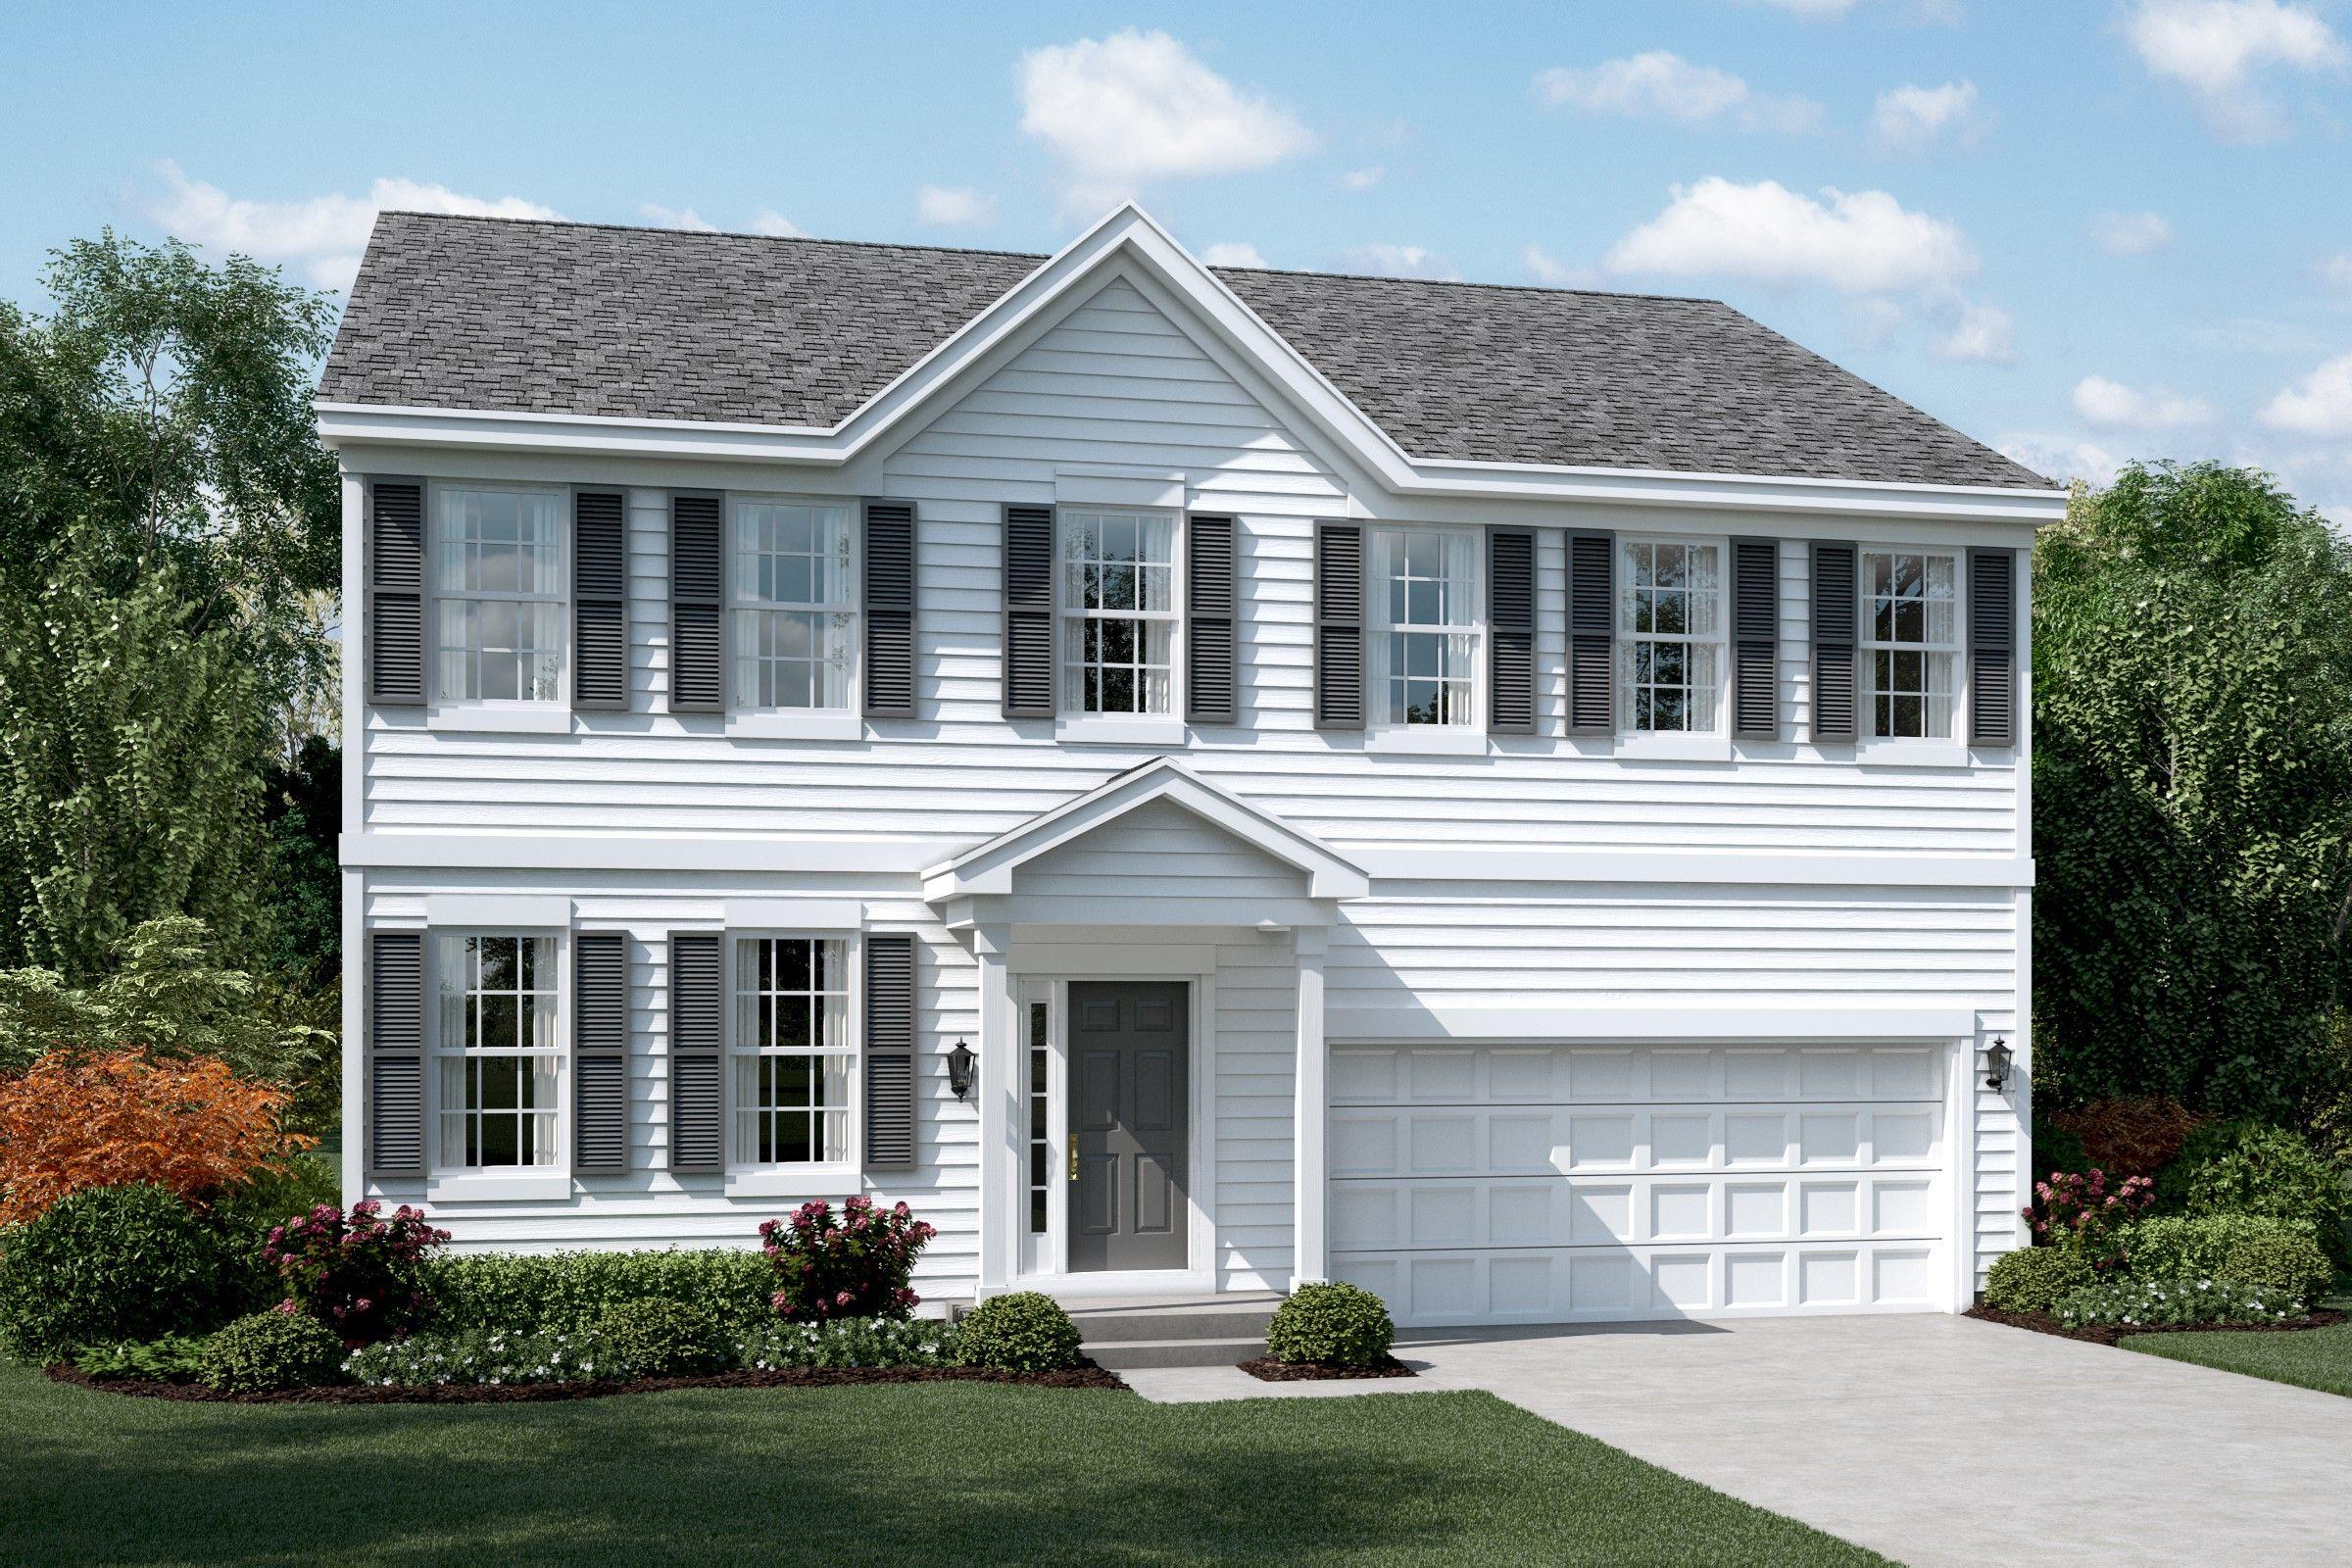 Single Family for Sale at The Estates Of Fox Chase - Betony 200 Gates Creek Drive Oswego, Illinois 60543 United States